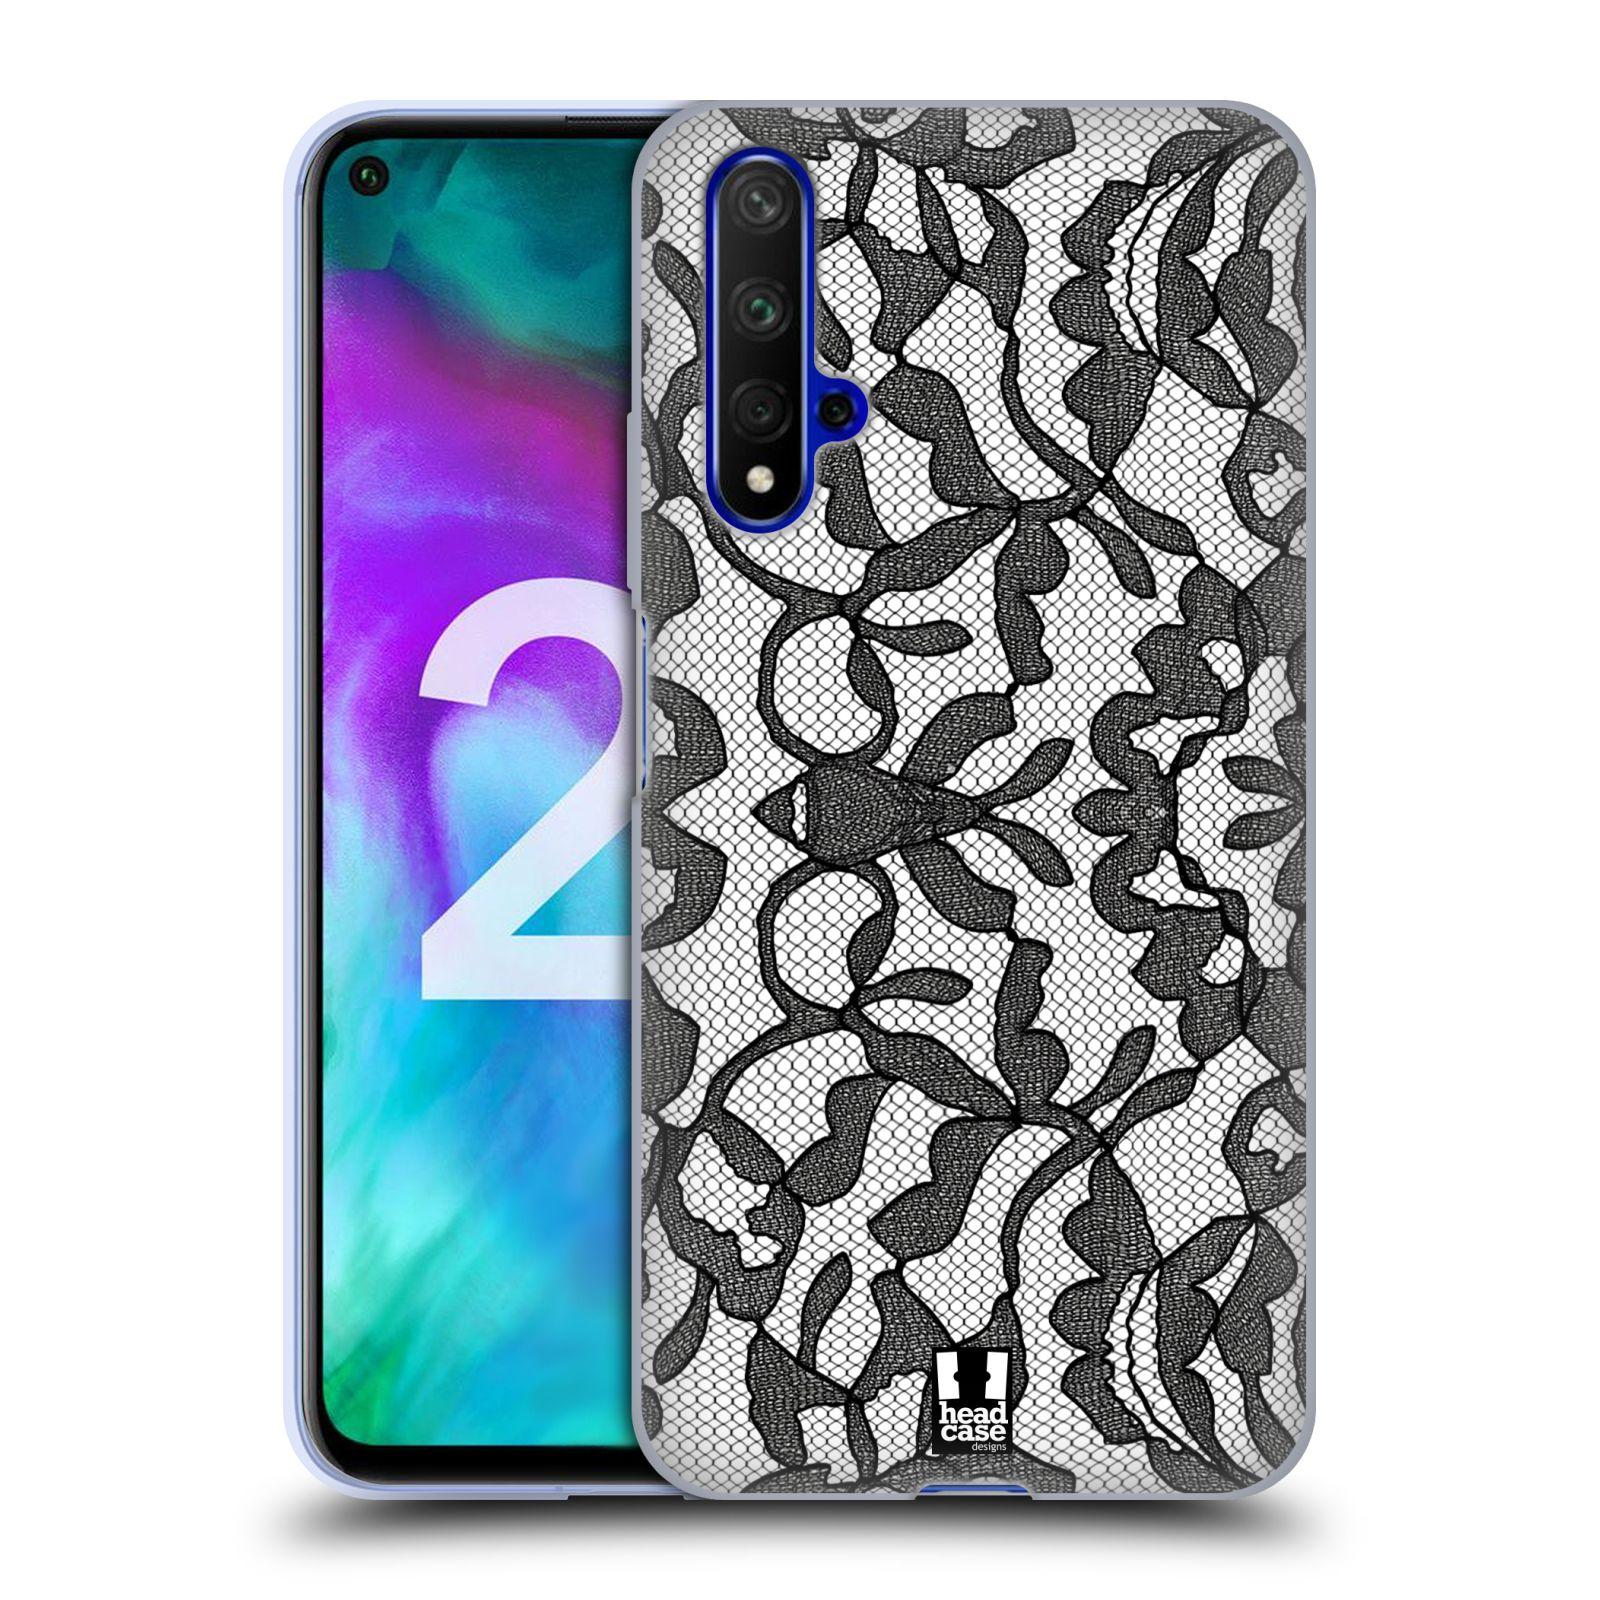 Silikonové pouzdro na mobil Honor 20 - Head Case - LEAFY KRAJKA